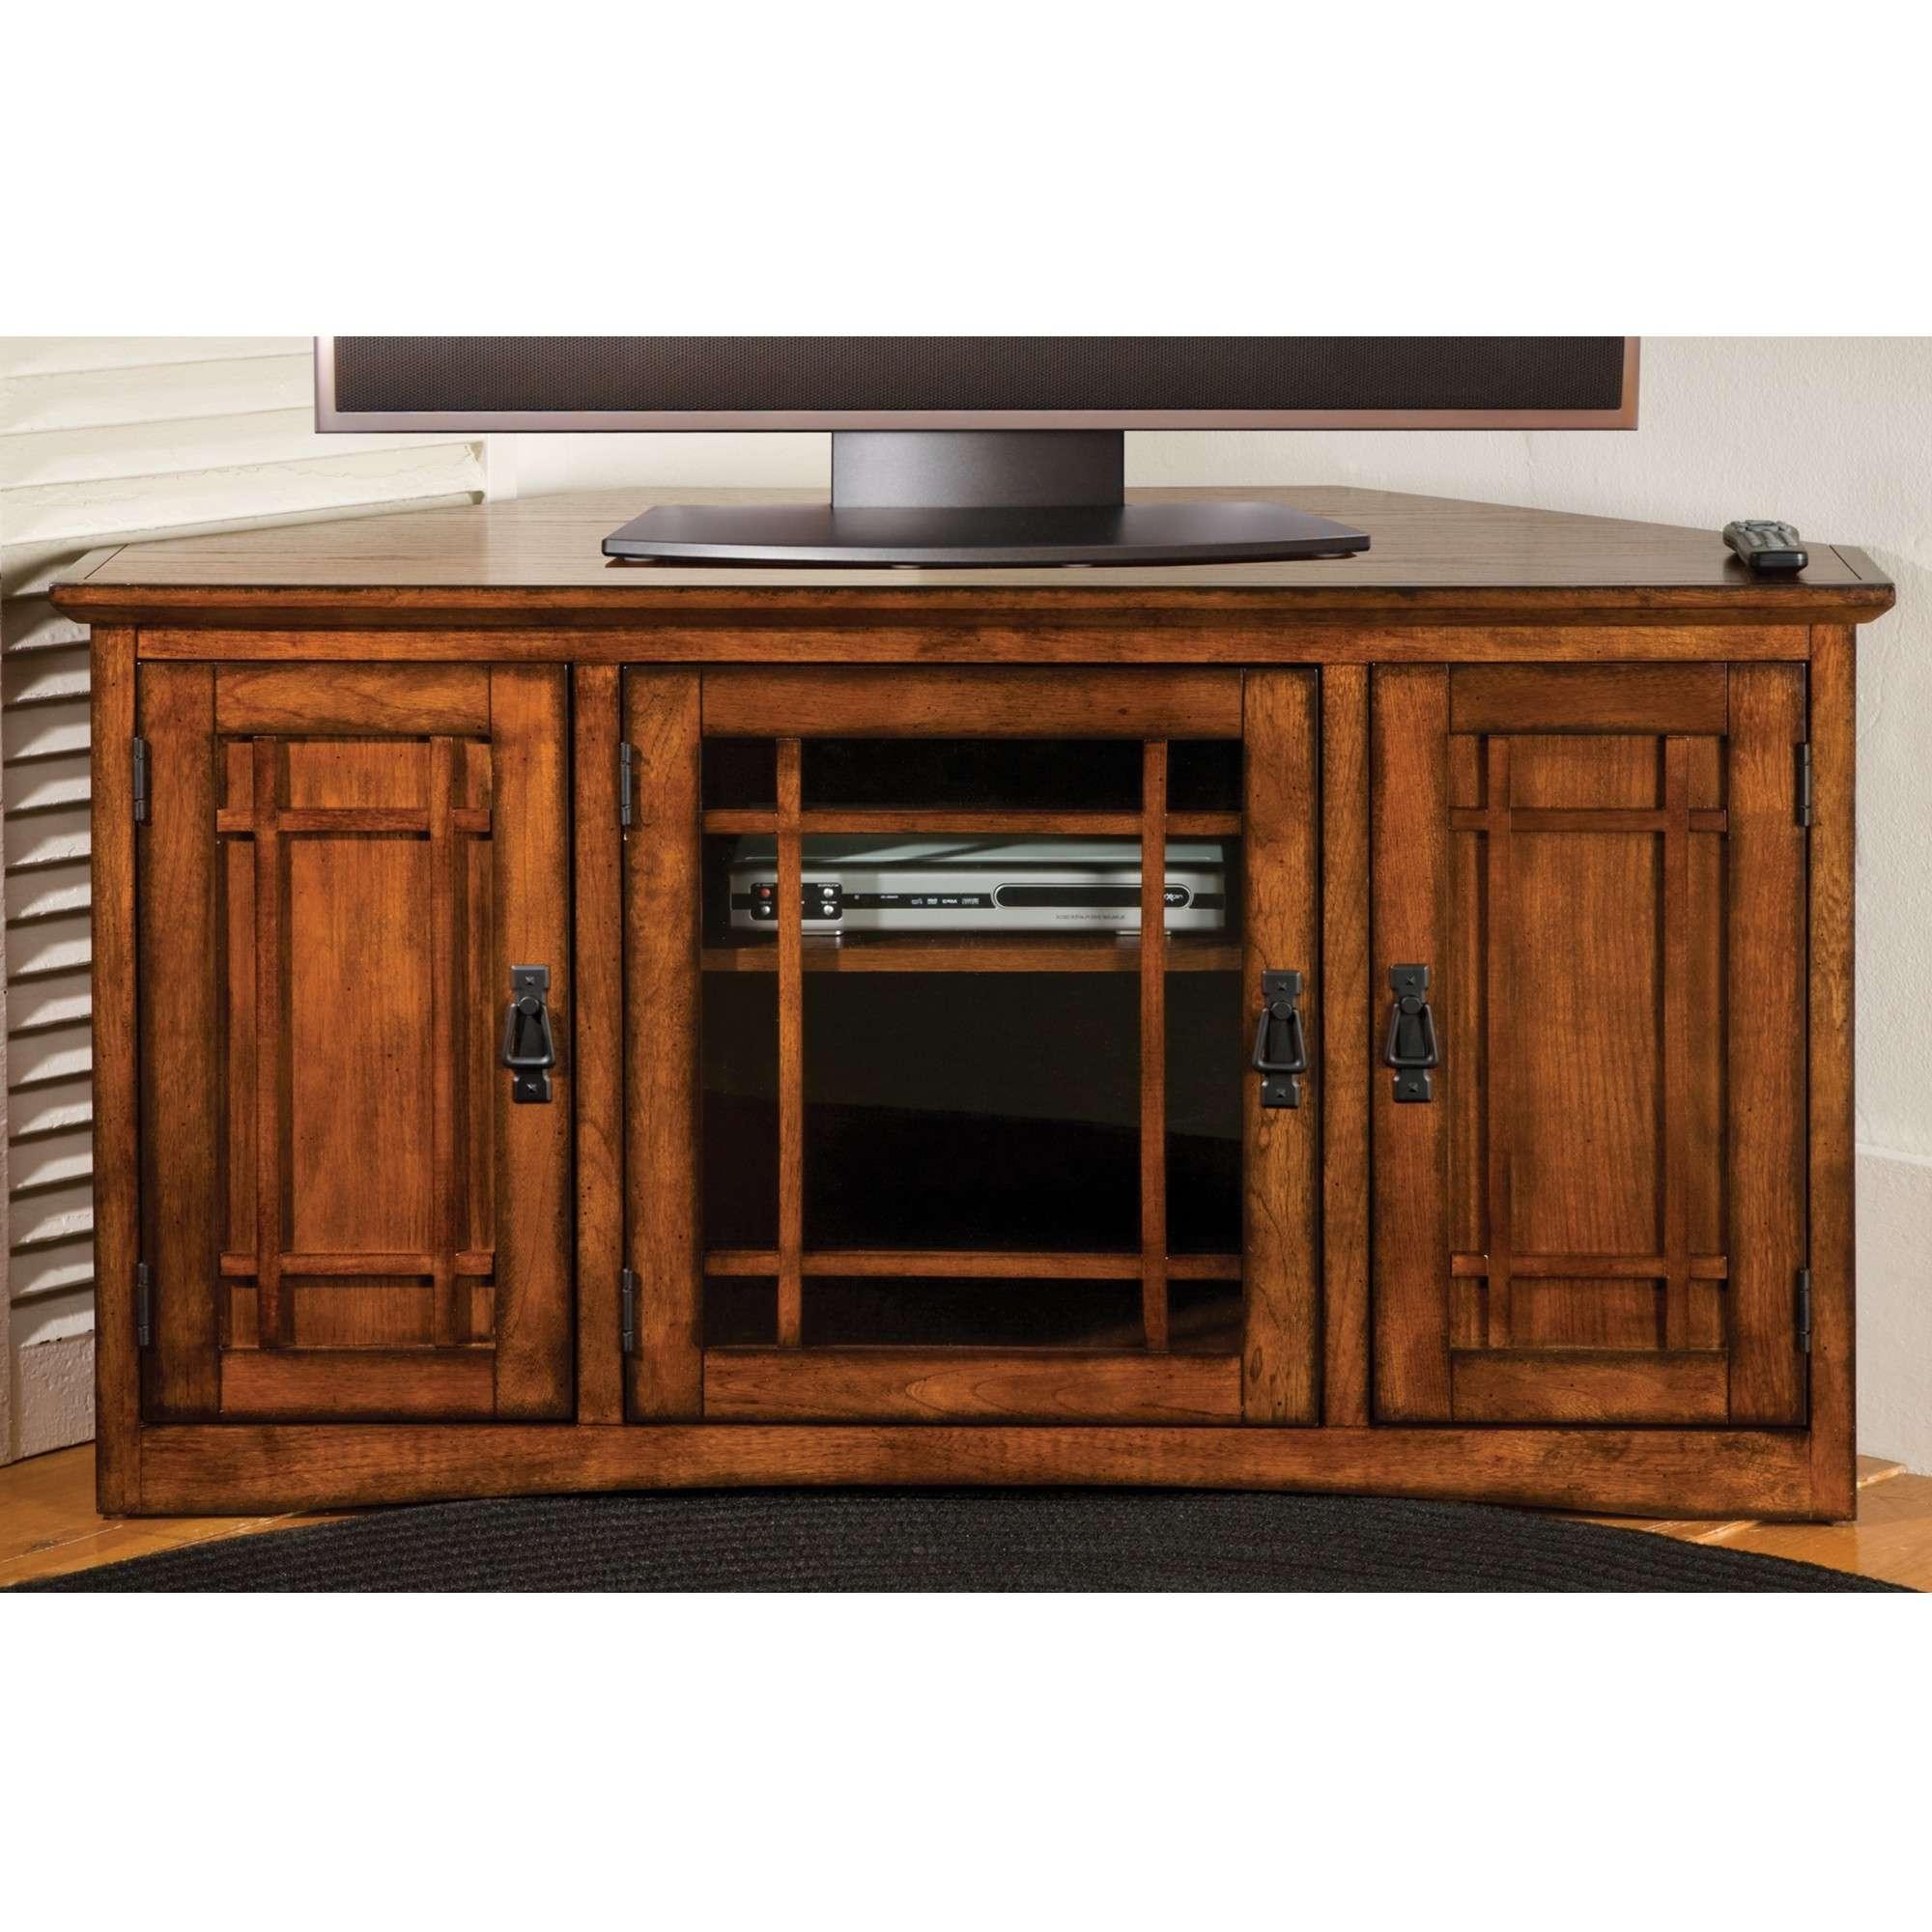 Mission Corner Tv Cabinet | Sturbridge Yankee Workshop Regarding Small Corner Tv Cabinets (View 13 of 20)